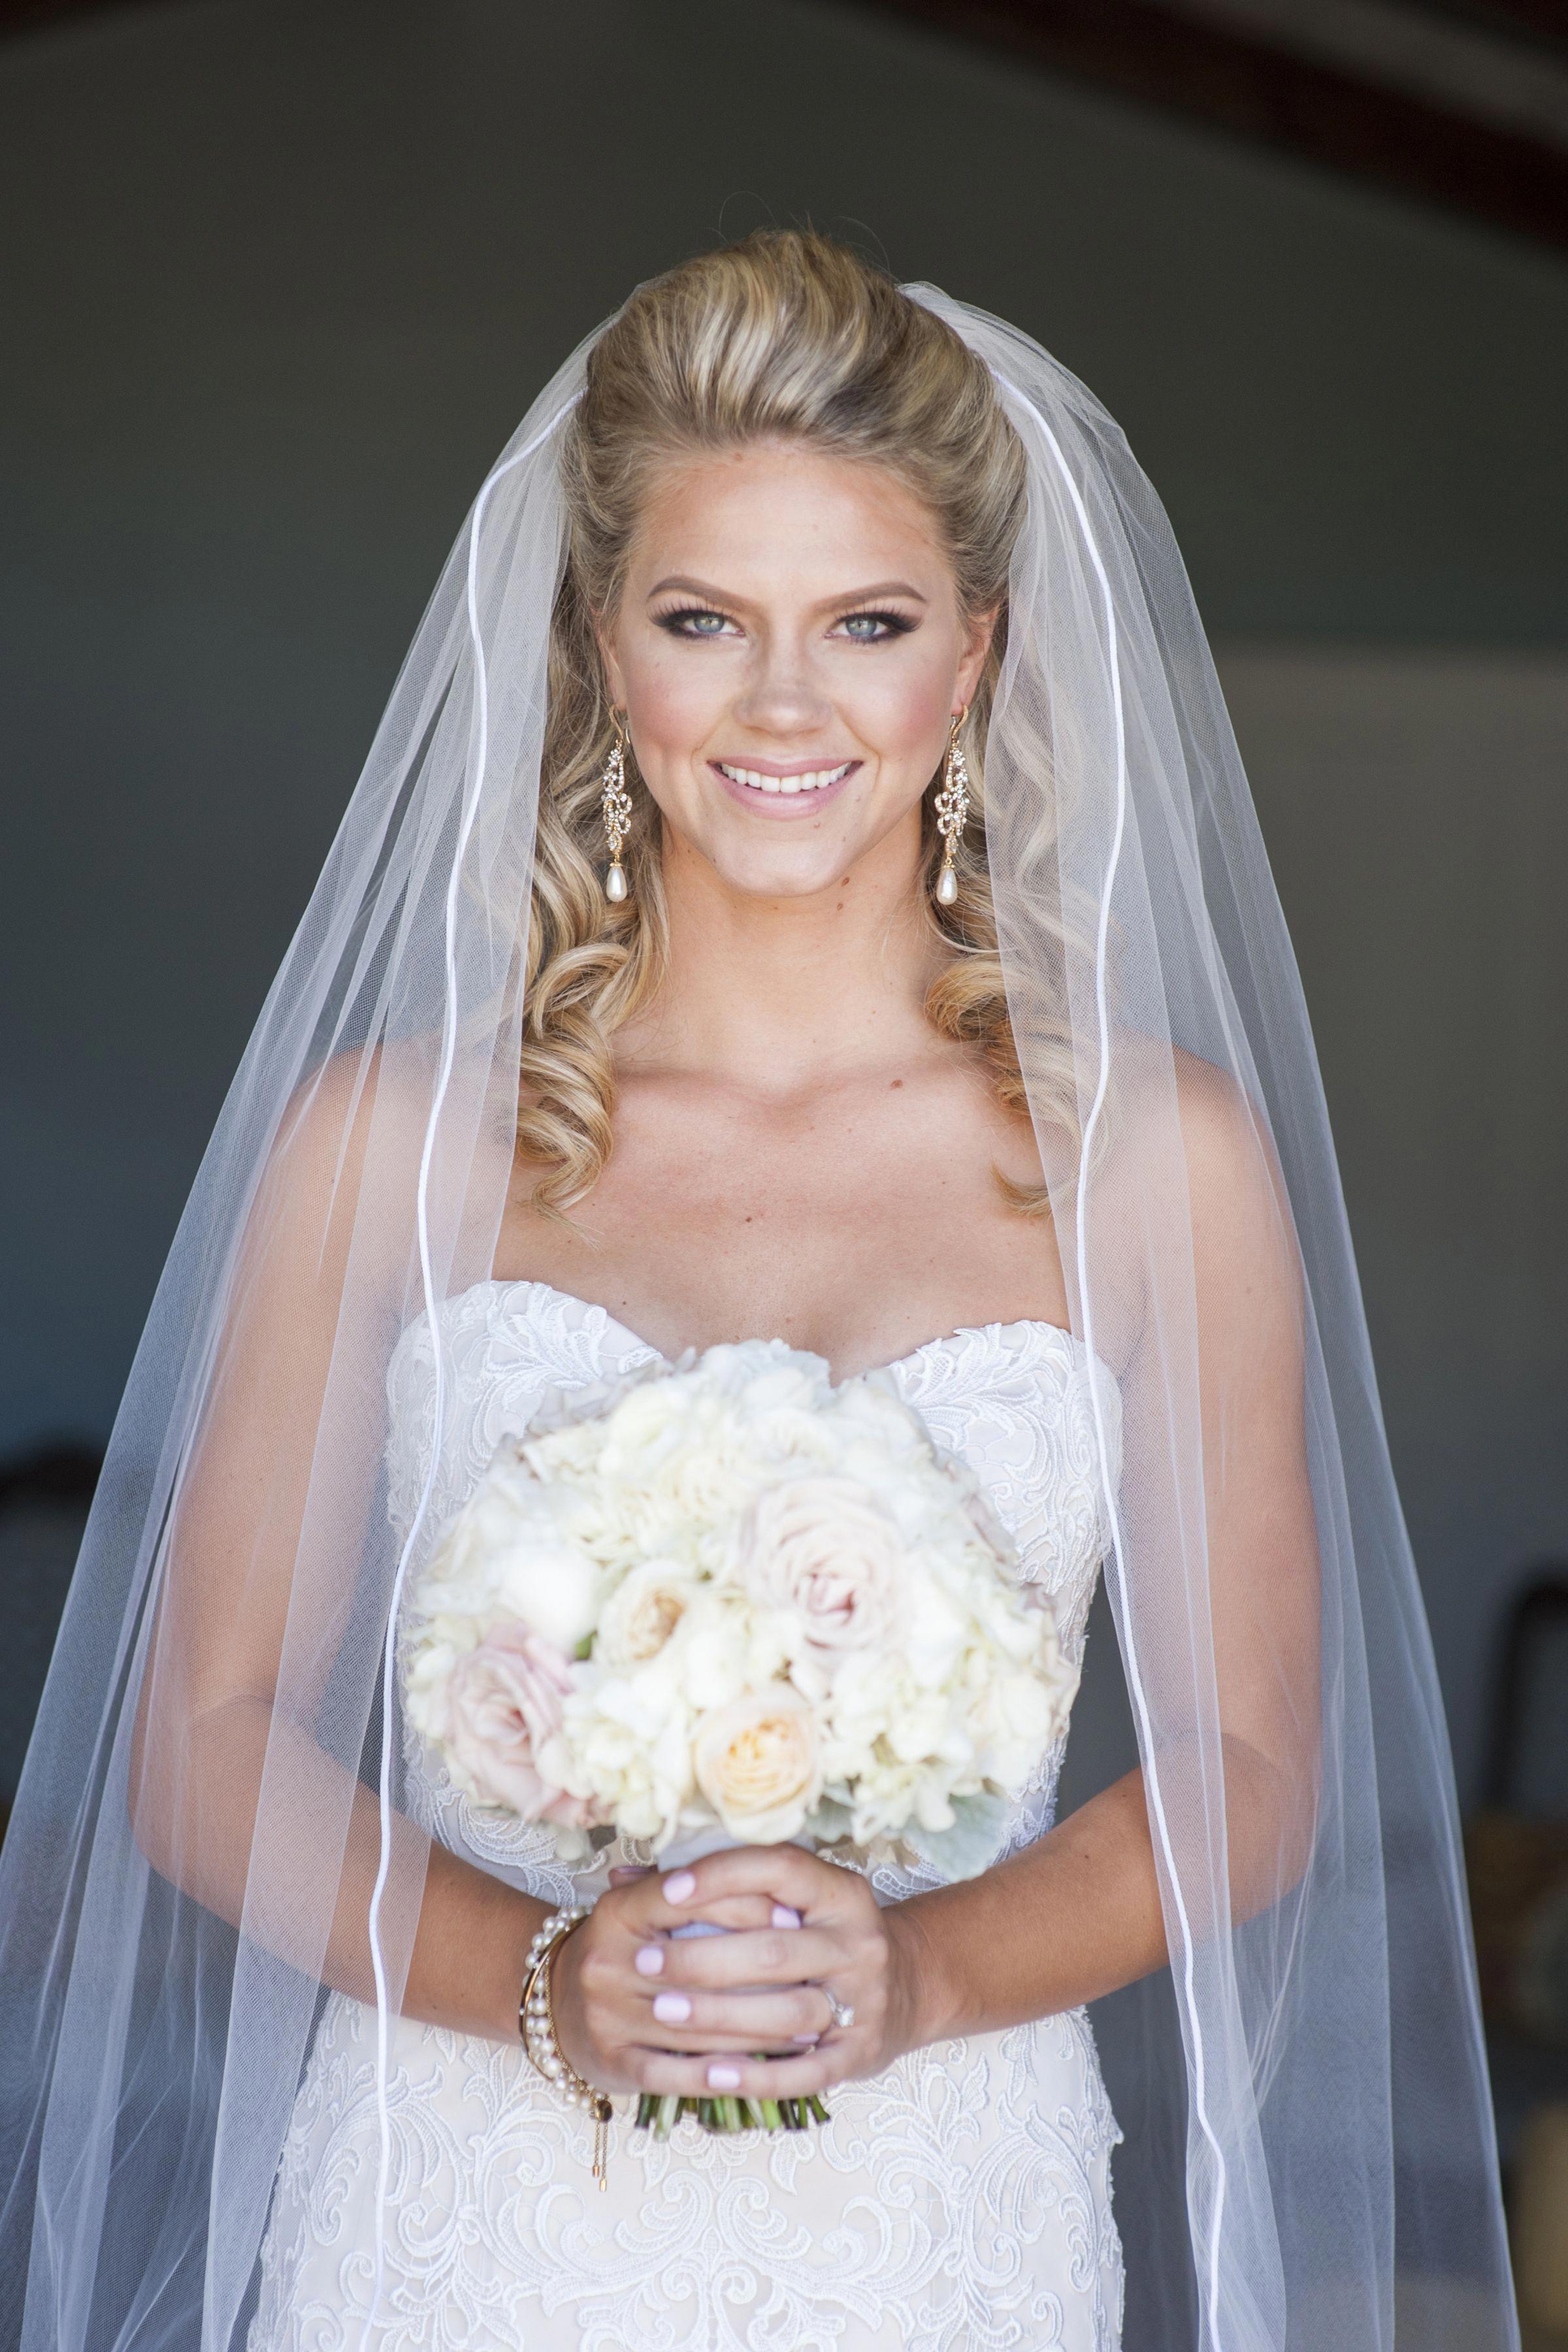 Bride Dress Wedding Down Bouquet Silhouette Cathedral Veil Make Up Hair Half Up Half Down Weddinghairstyles Veil Hairstyles Bridal Hair Veil Wedding Hair Down